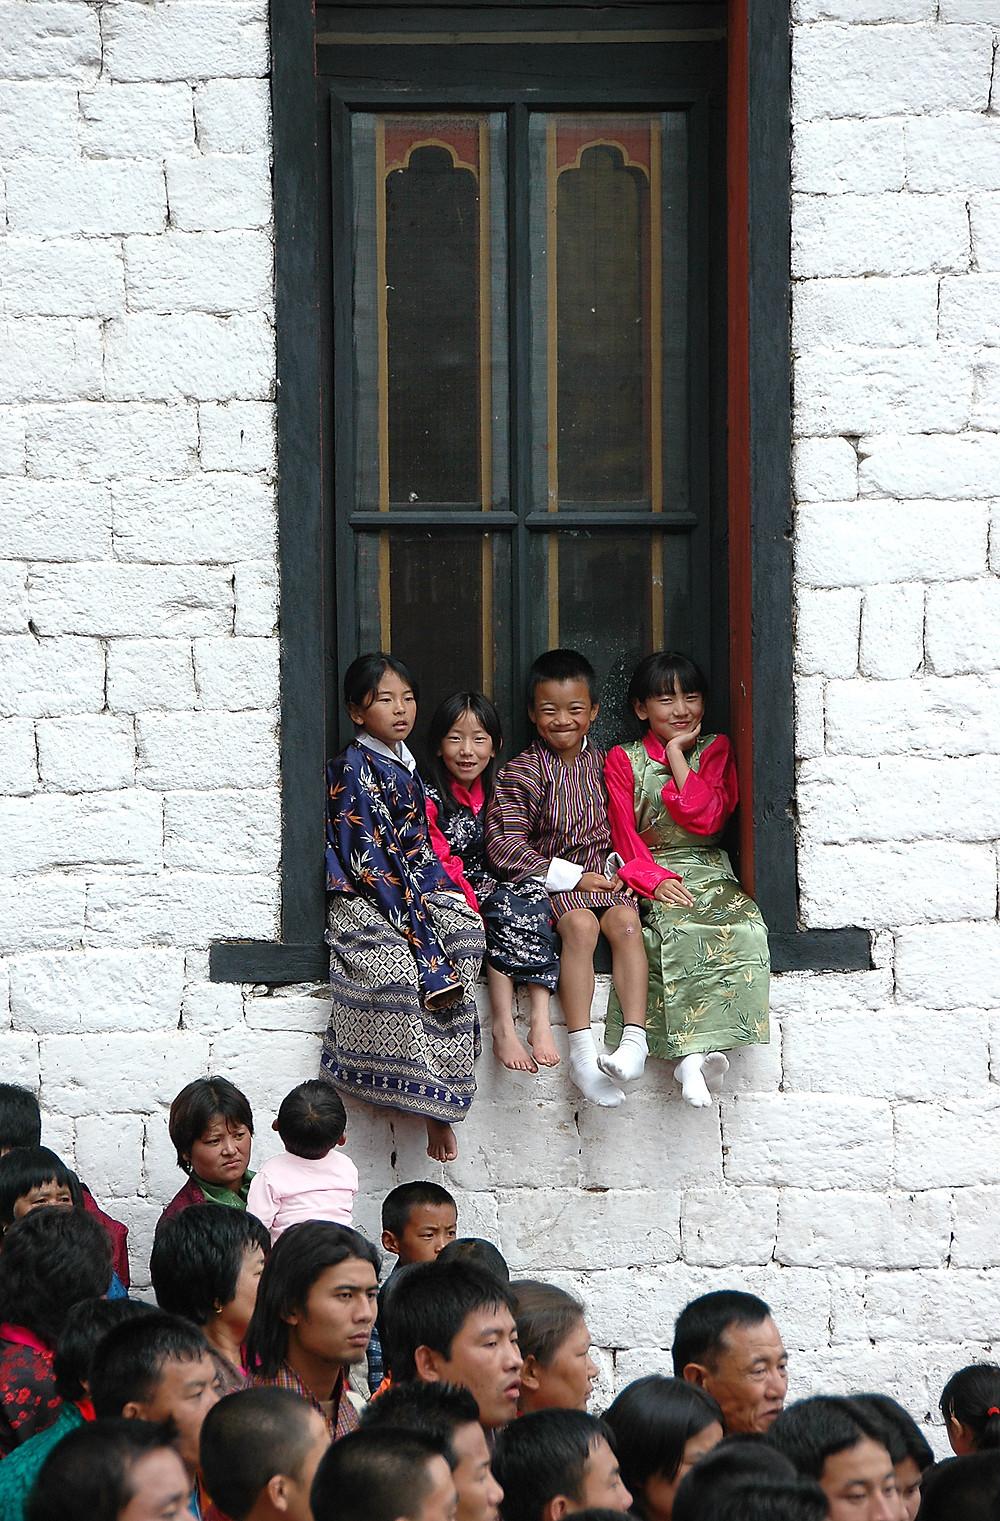 Bhutanese children in their festival best